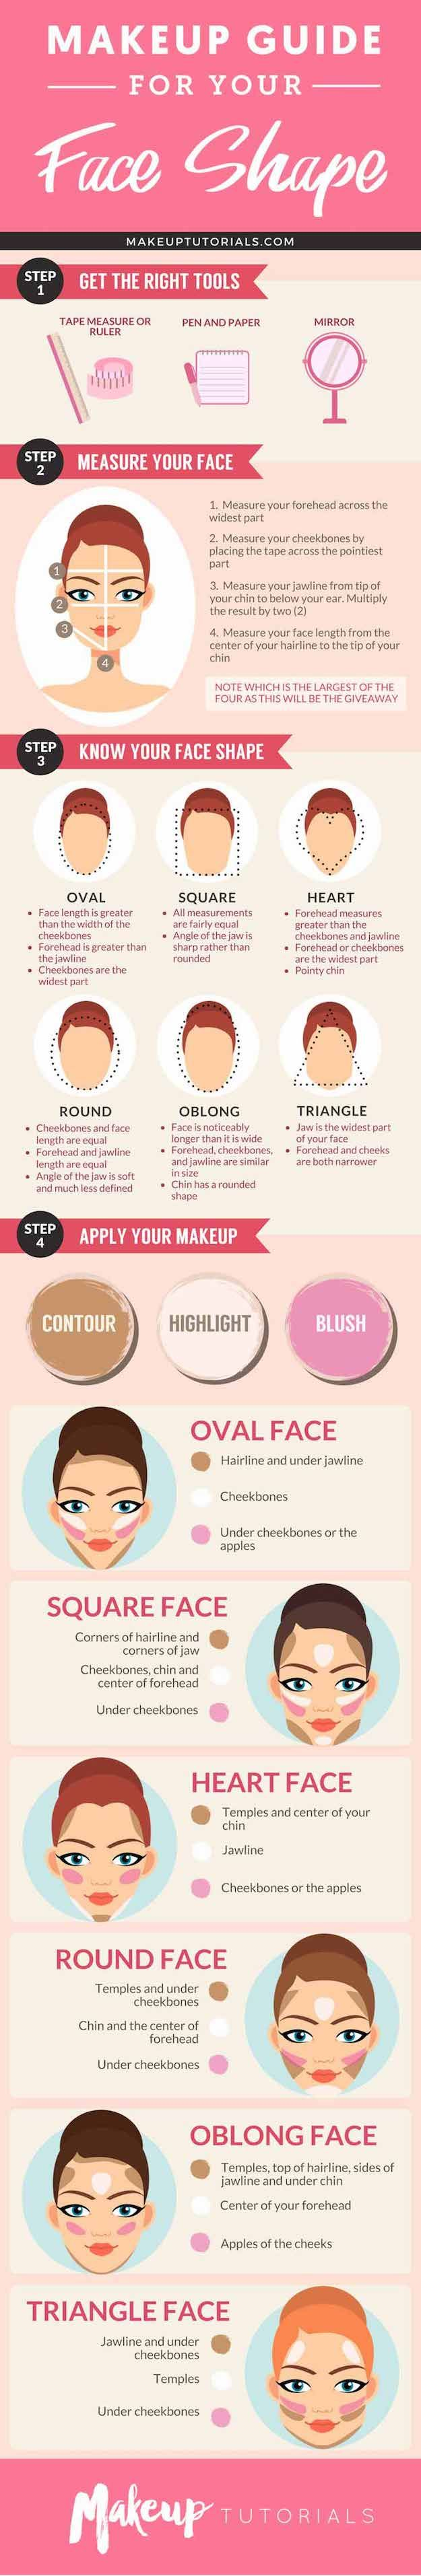 How to Contour Your Face Depending On Your Face Shape | Best Makeup Tutorials An...